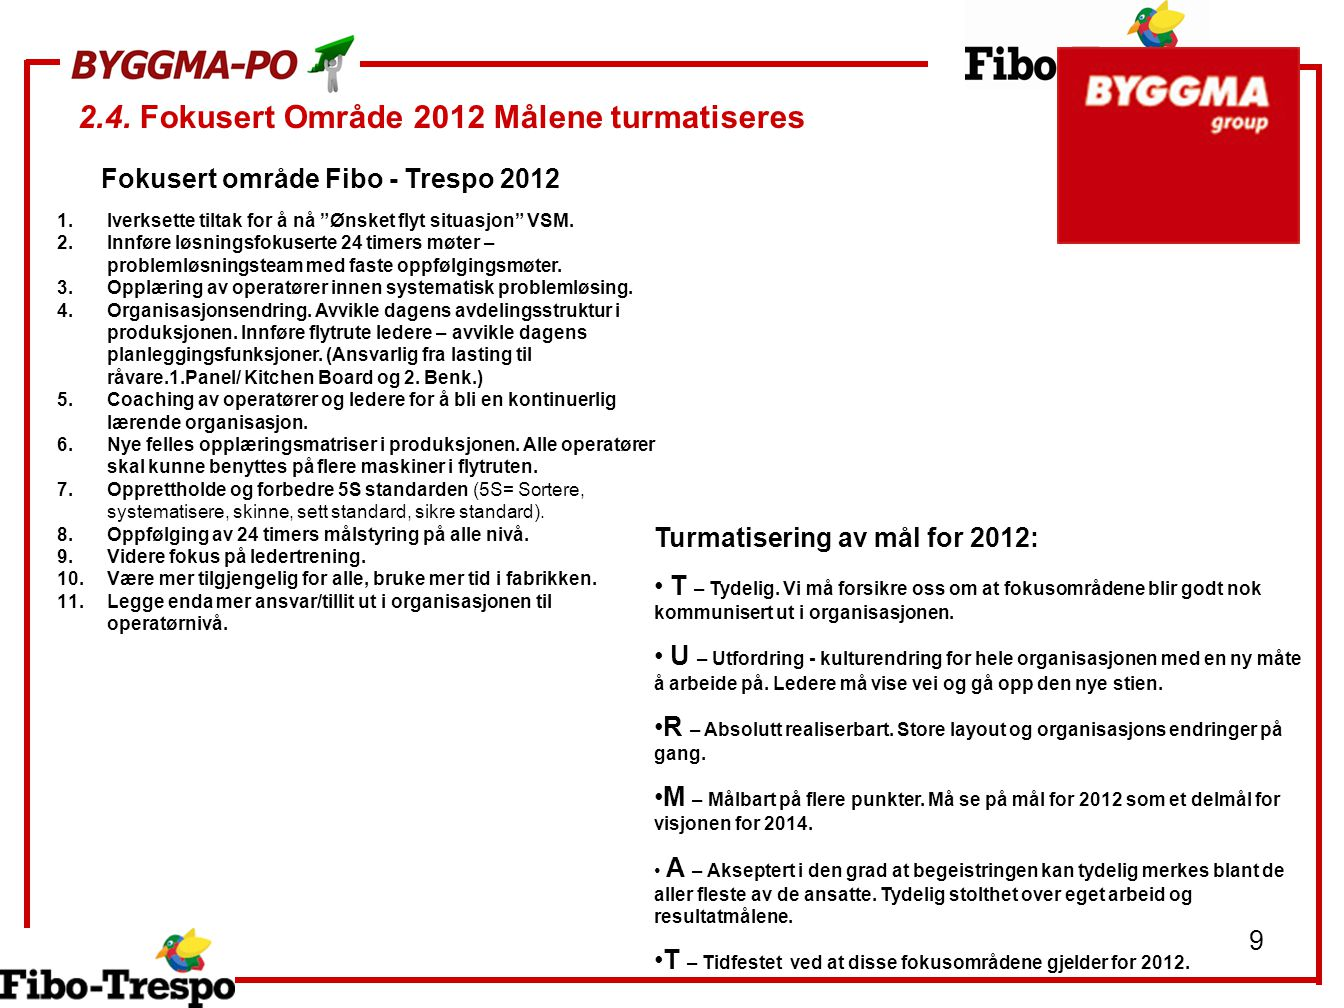 Fokusert område Fibo - Trespo 2012